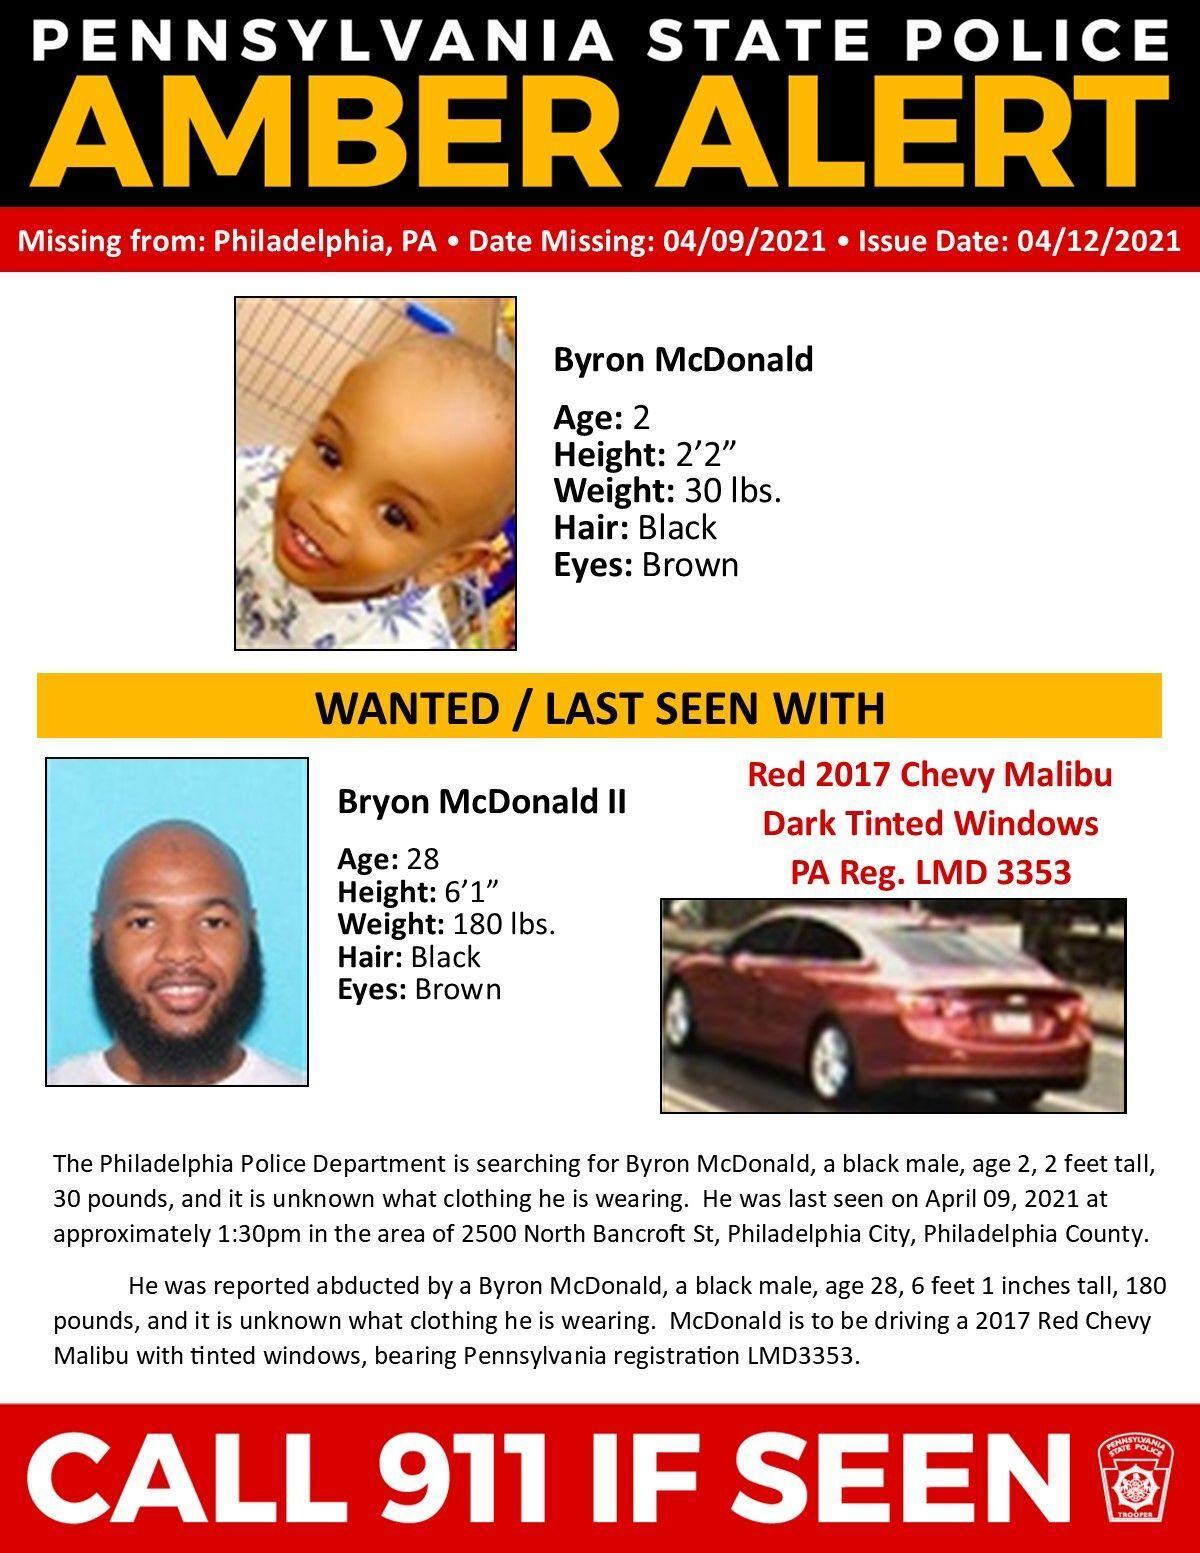 Pennsylvania Amber Alert poster